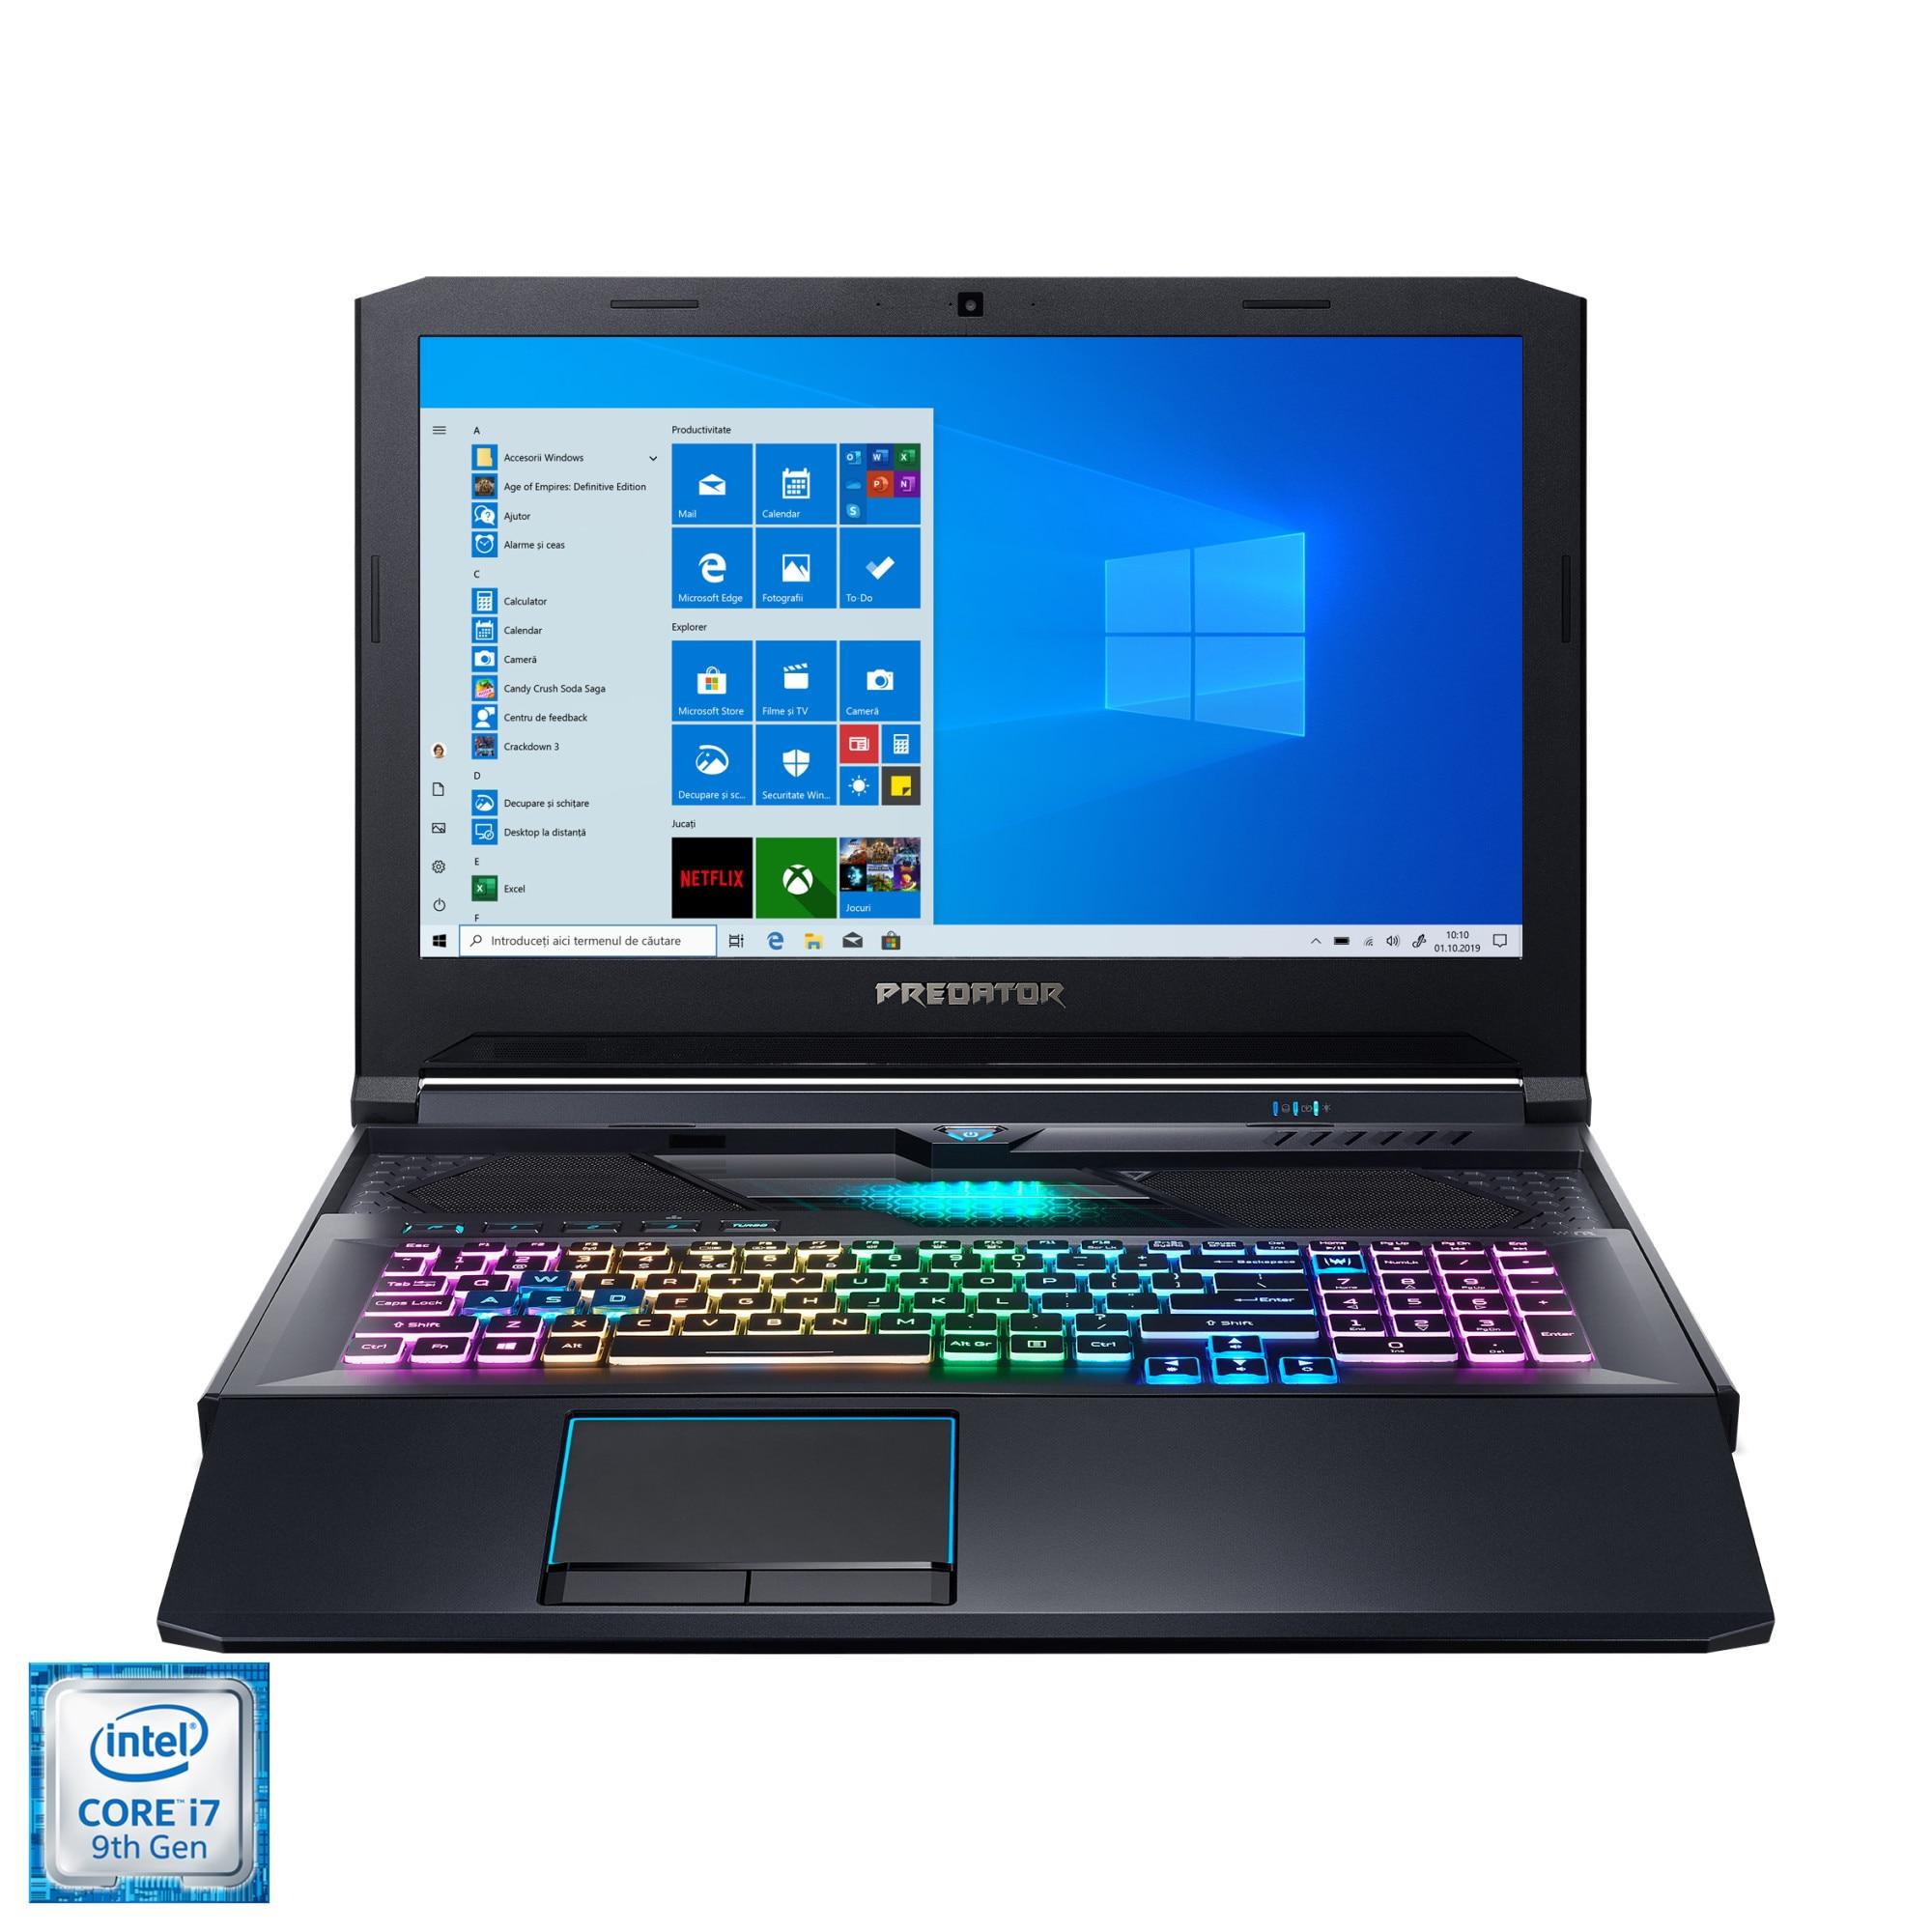 "Fotografie Laptop Gaming Acer Predator Helios 700 PH717-71 cu procesor Intel Core i7-9750H pana la 4.50 GHz, 17.3"", Full HD, 144Hz, G-Sync, 16GB, 1TB SSD, NVIDIA GeForce RTX2070 8GB, Windows 10 Home, Abyssal Black"